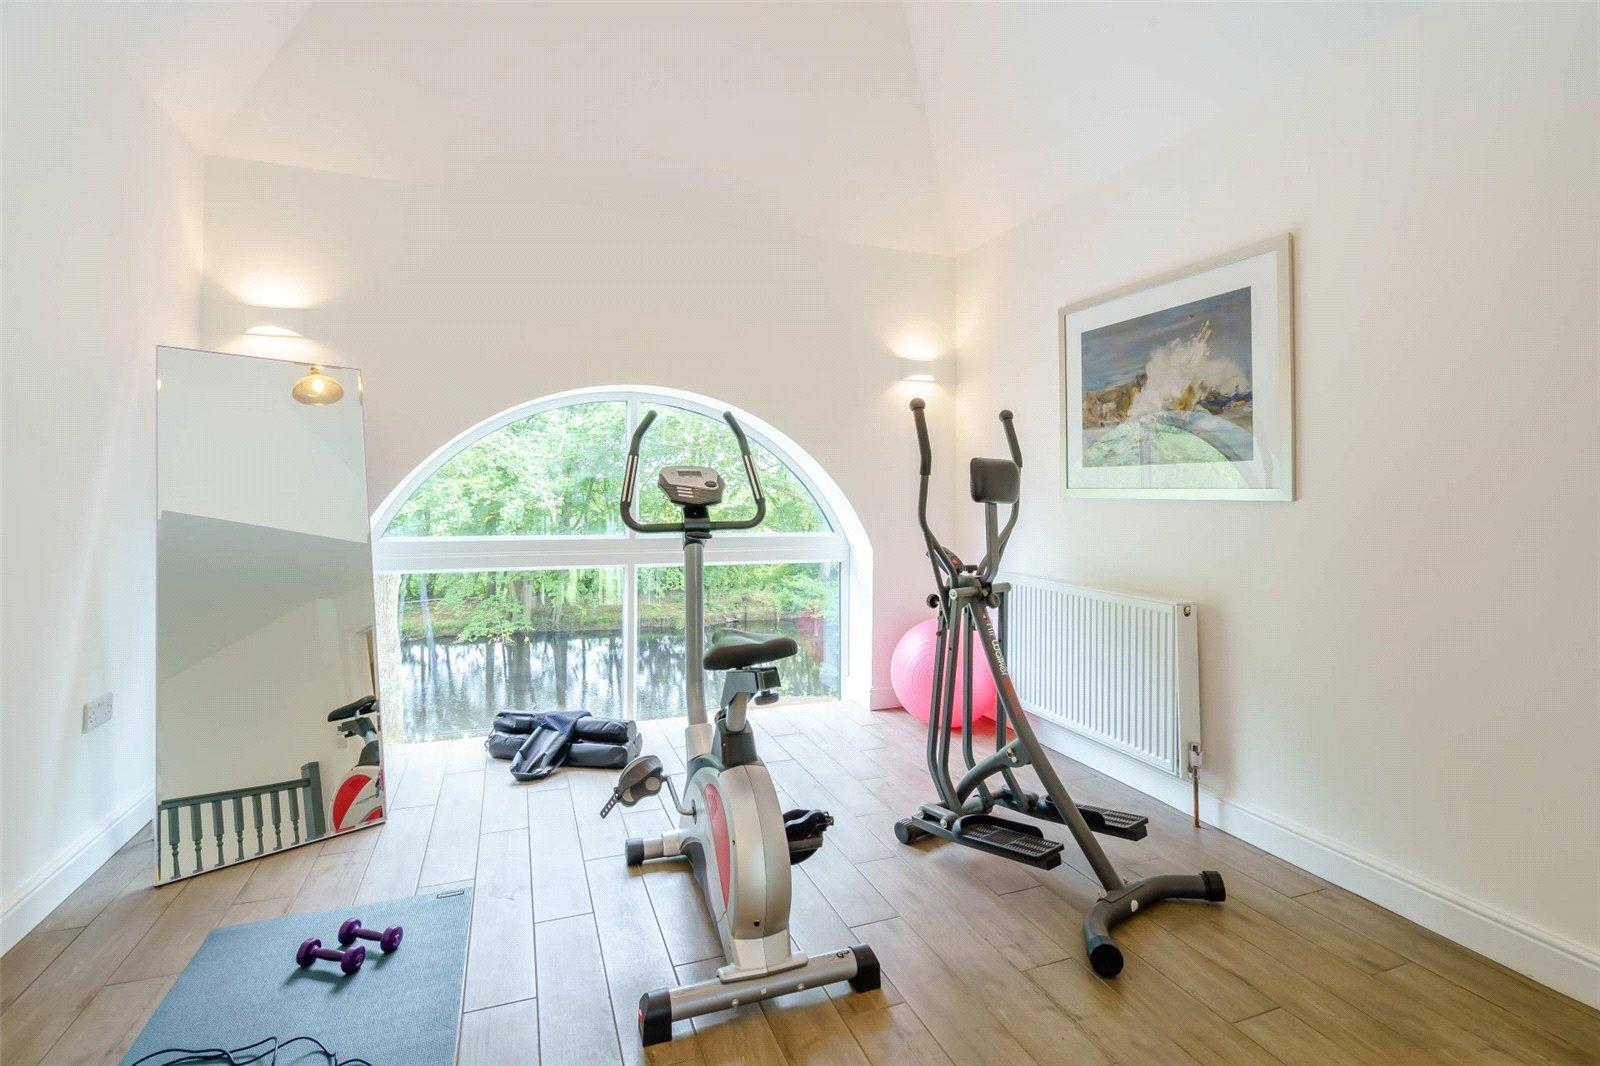 Rickmansworth, Hertfordshire, 5 Bedrooms, Home Gym